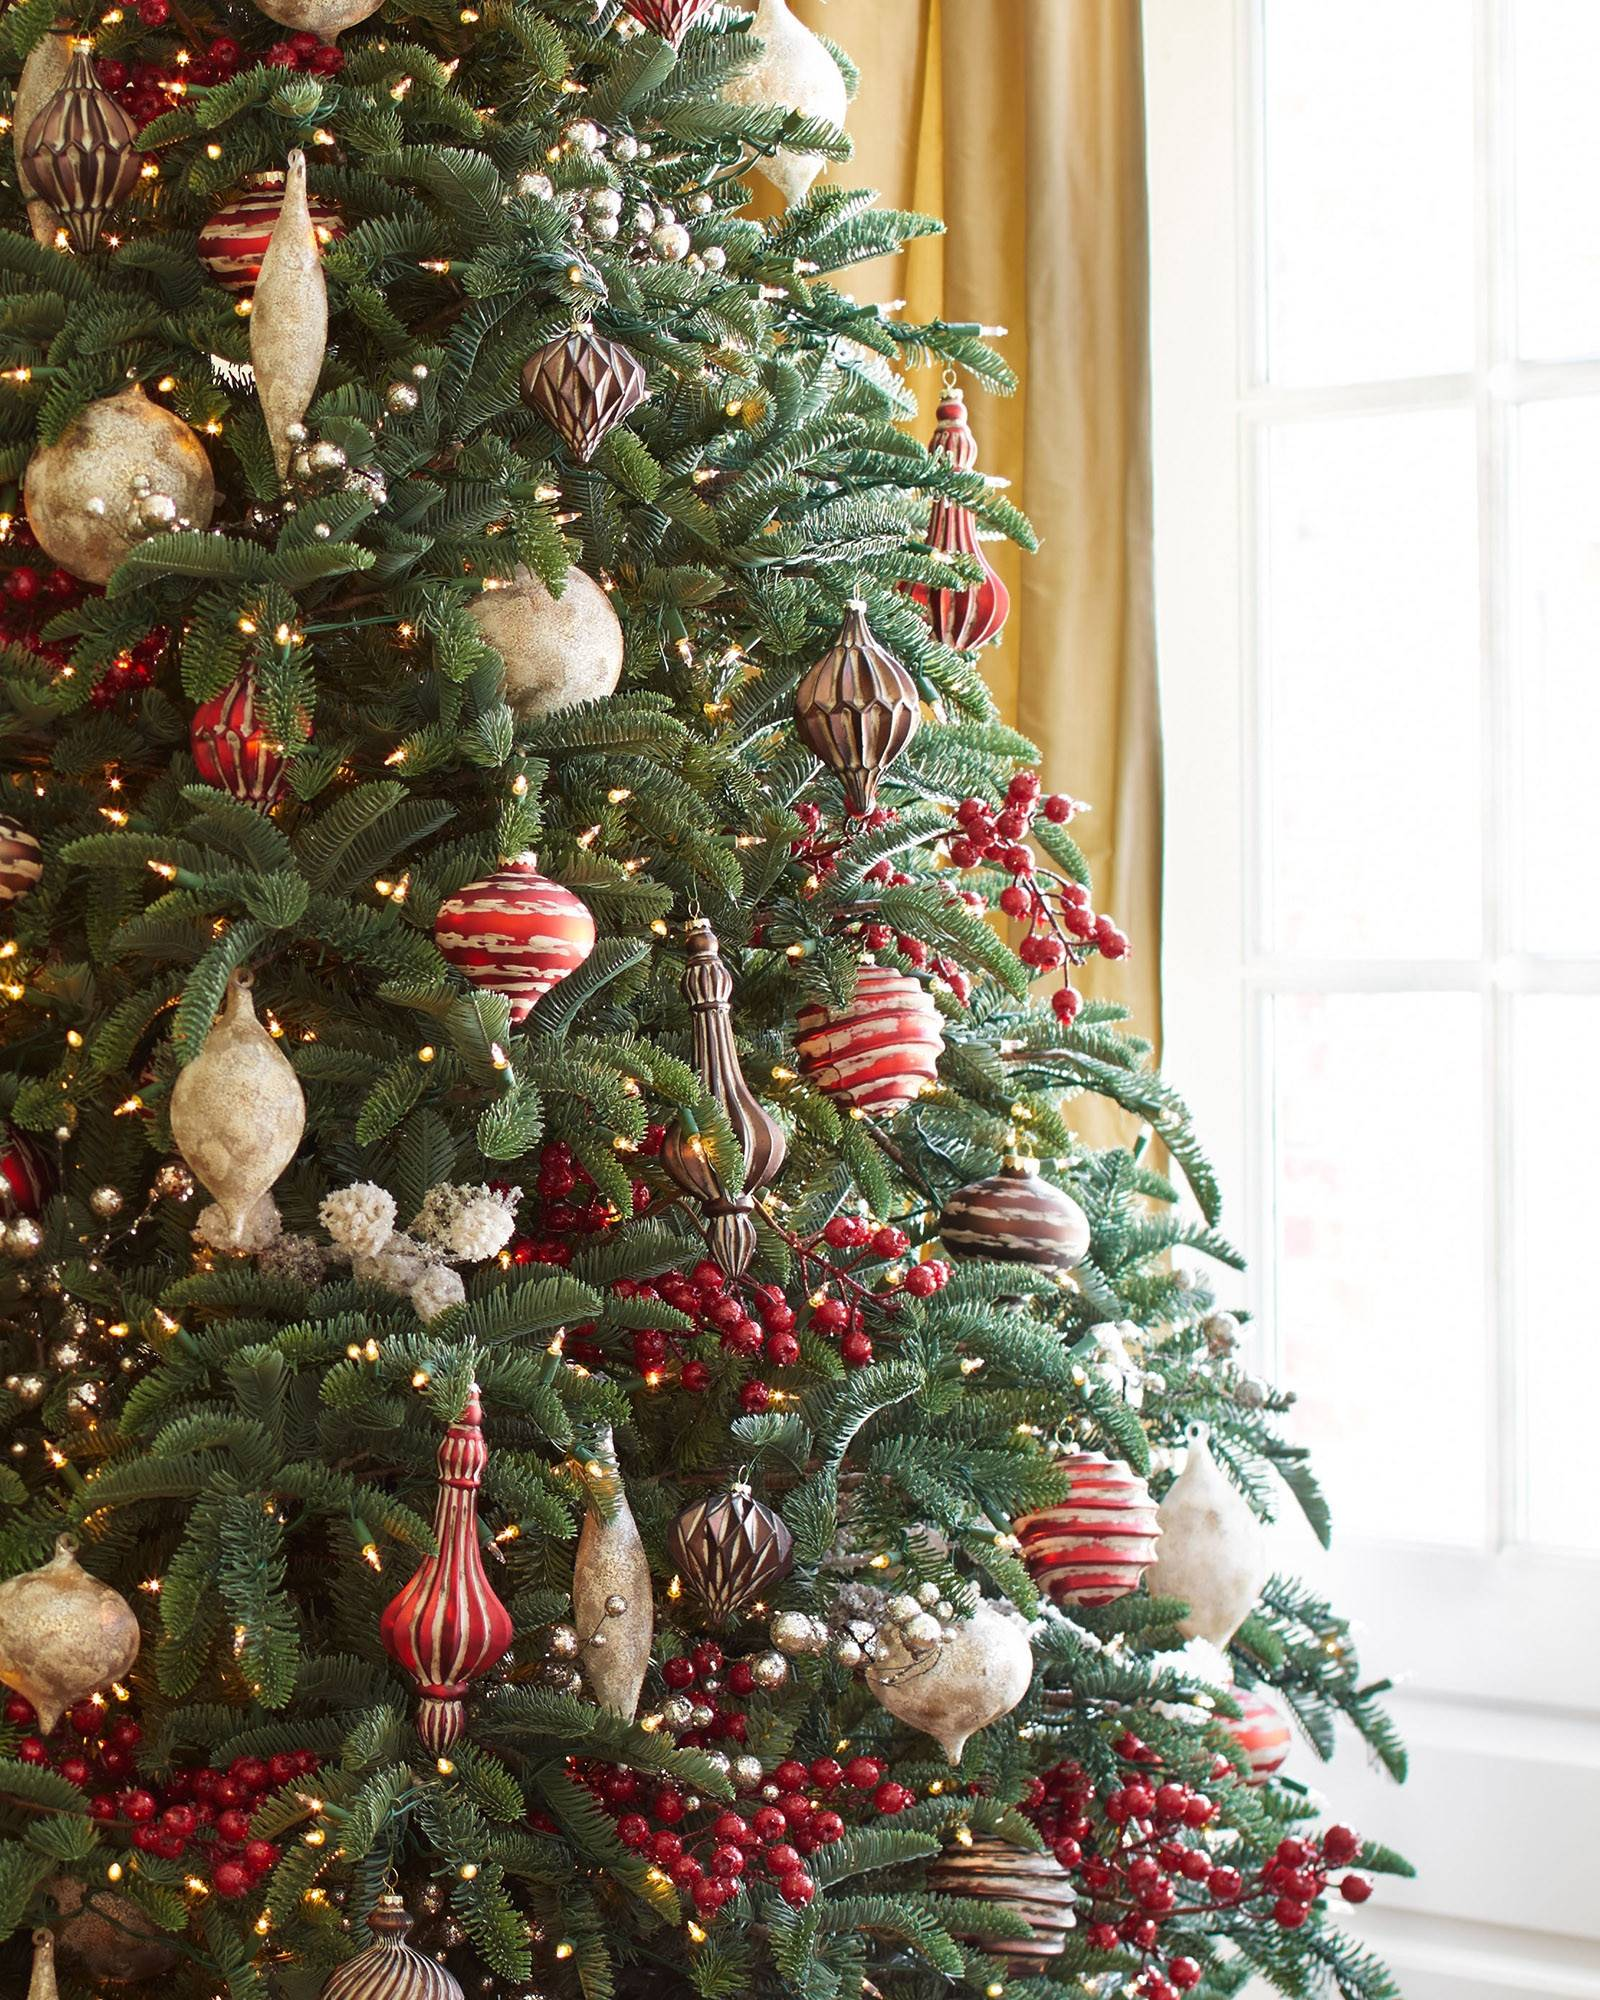 Noble Fir Christmas Tree.Noble Fir Artificial Christmas Tree Balsam Hill